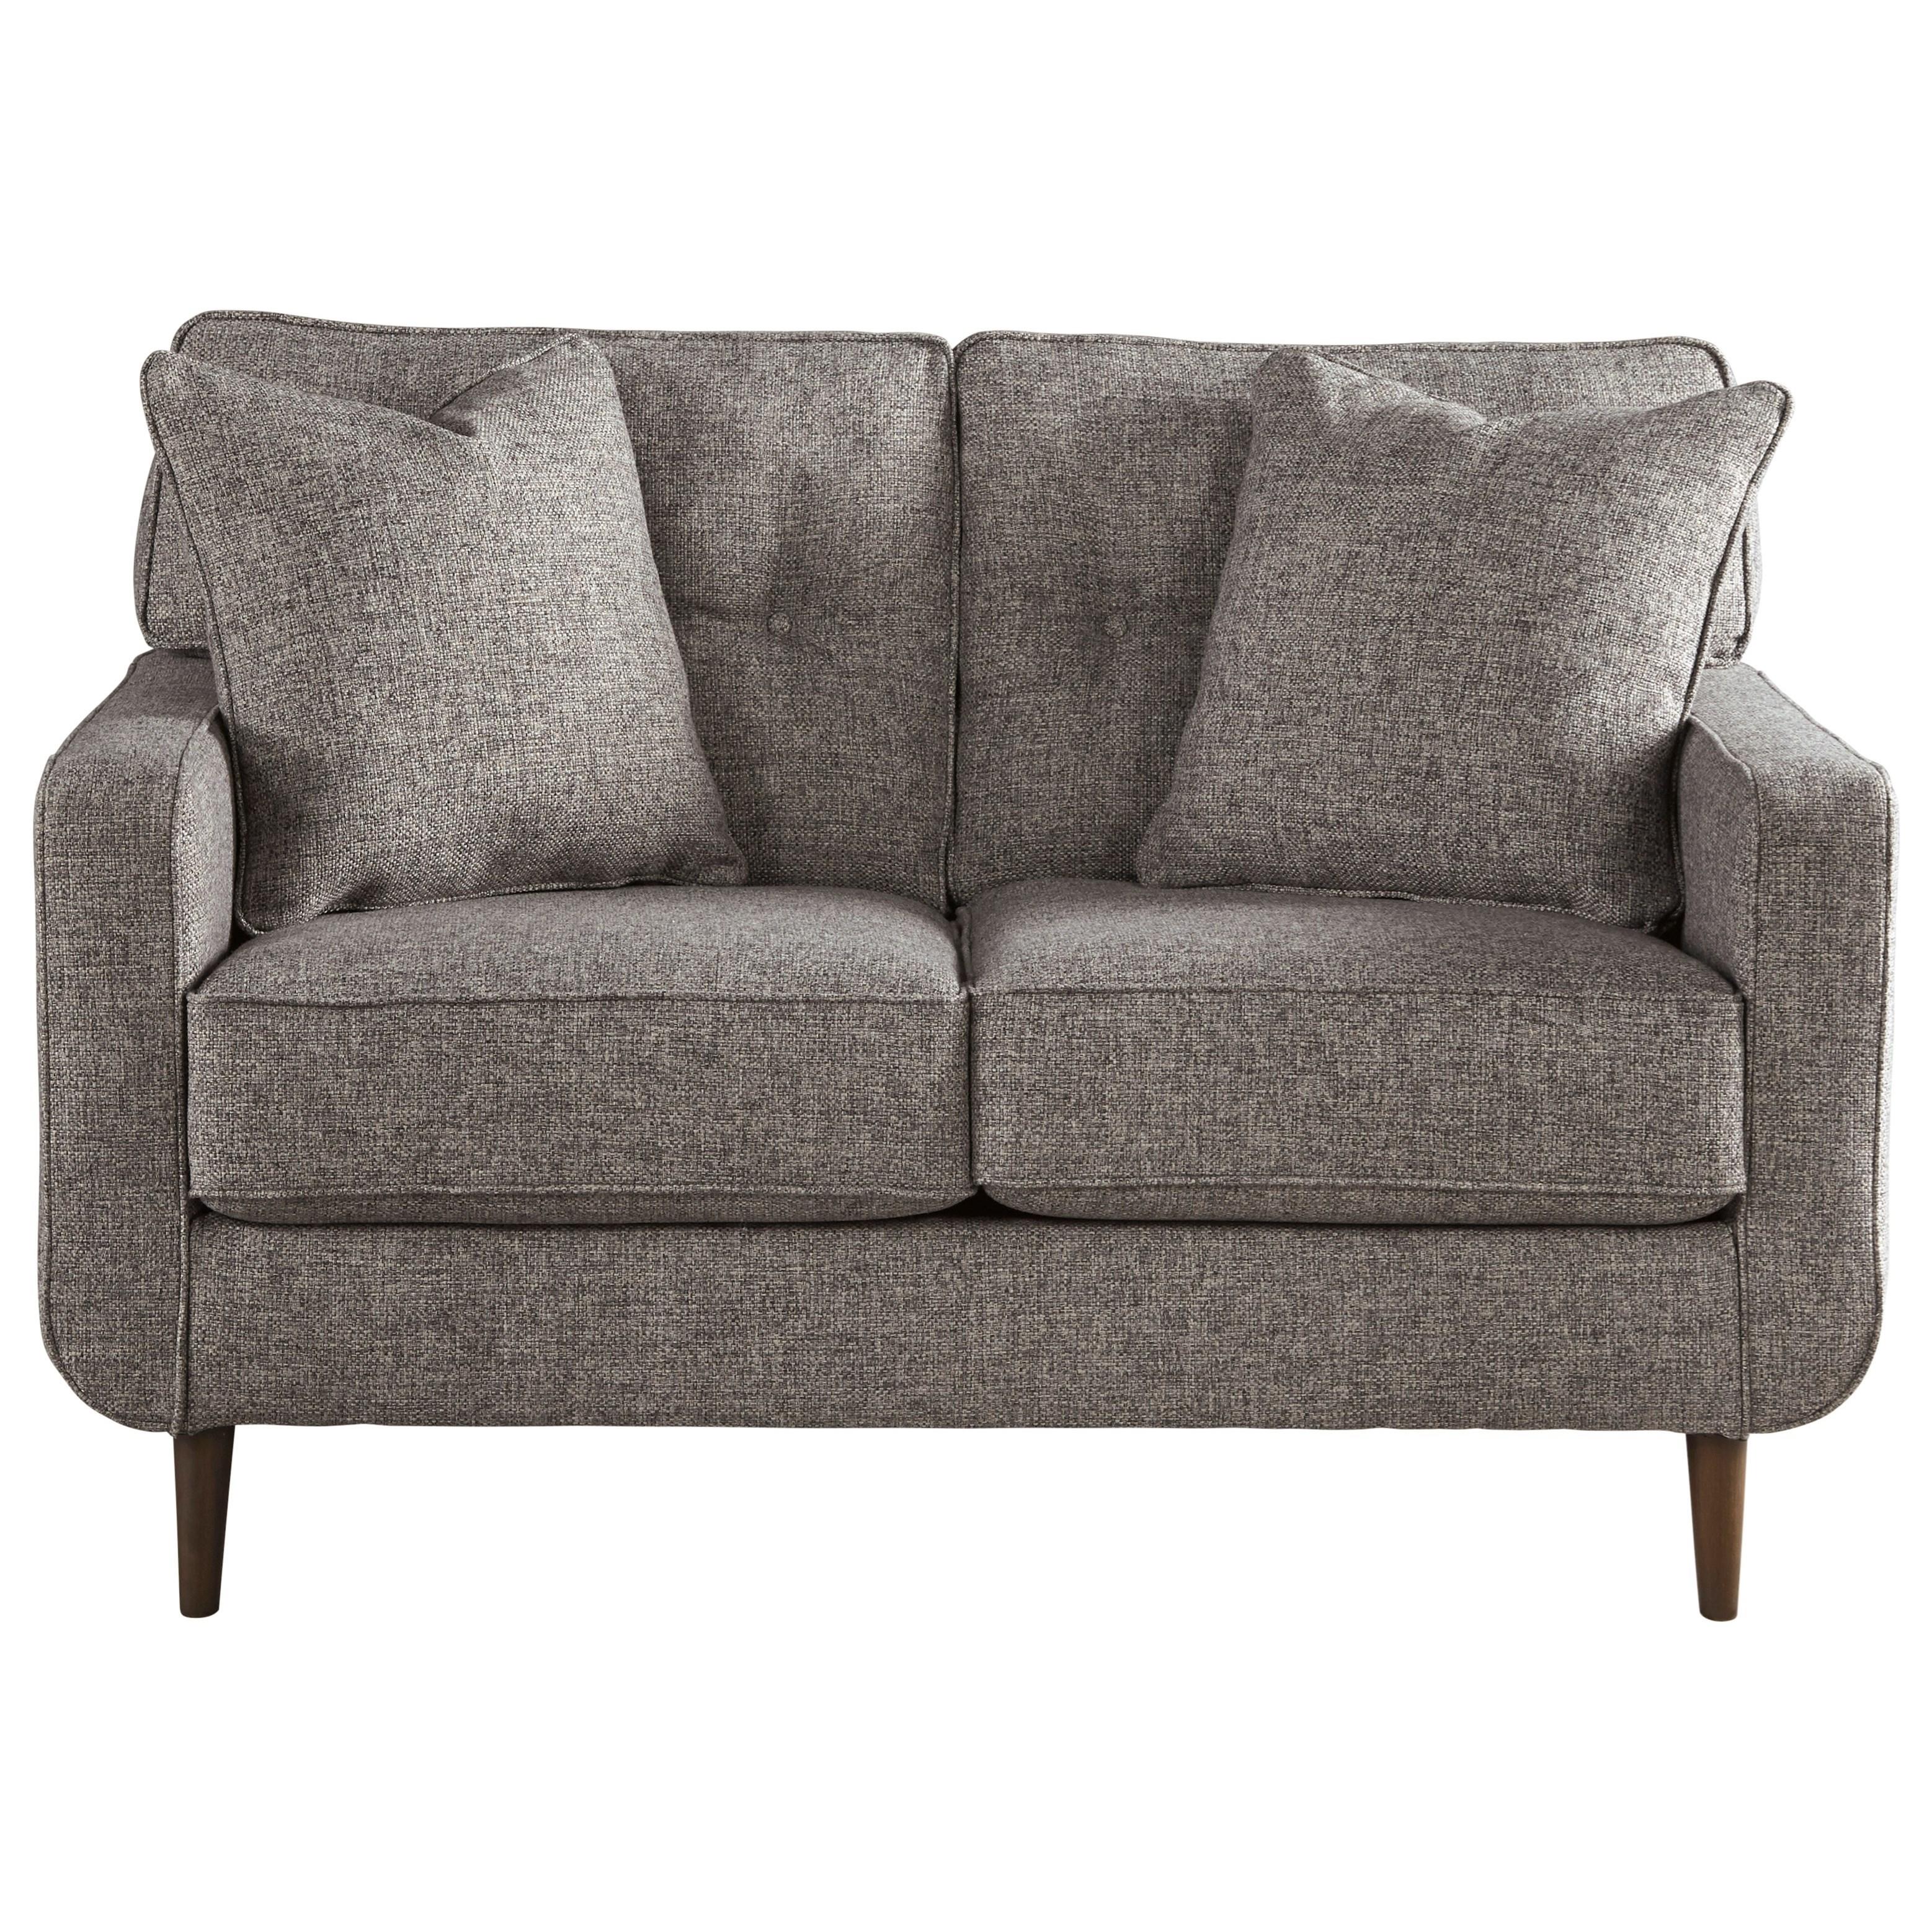 Ashley Furniture Zardoni Mid Century Modern Loveseat   Furniture And  ApplianceMart   Love Seats